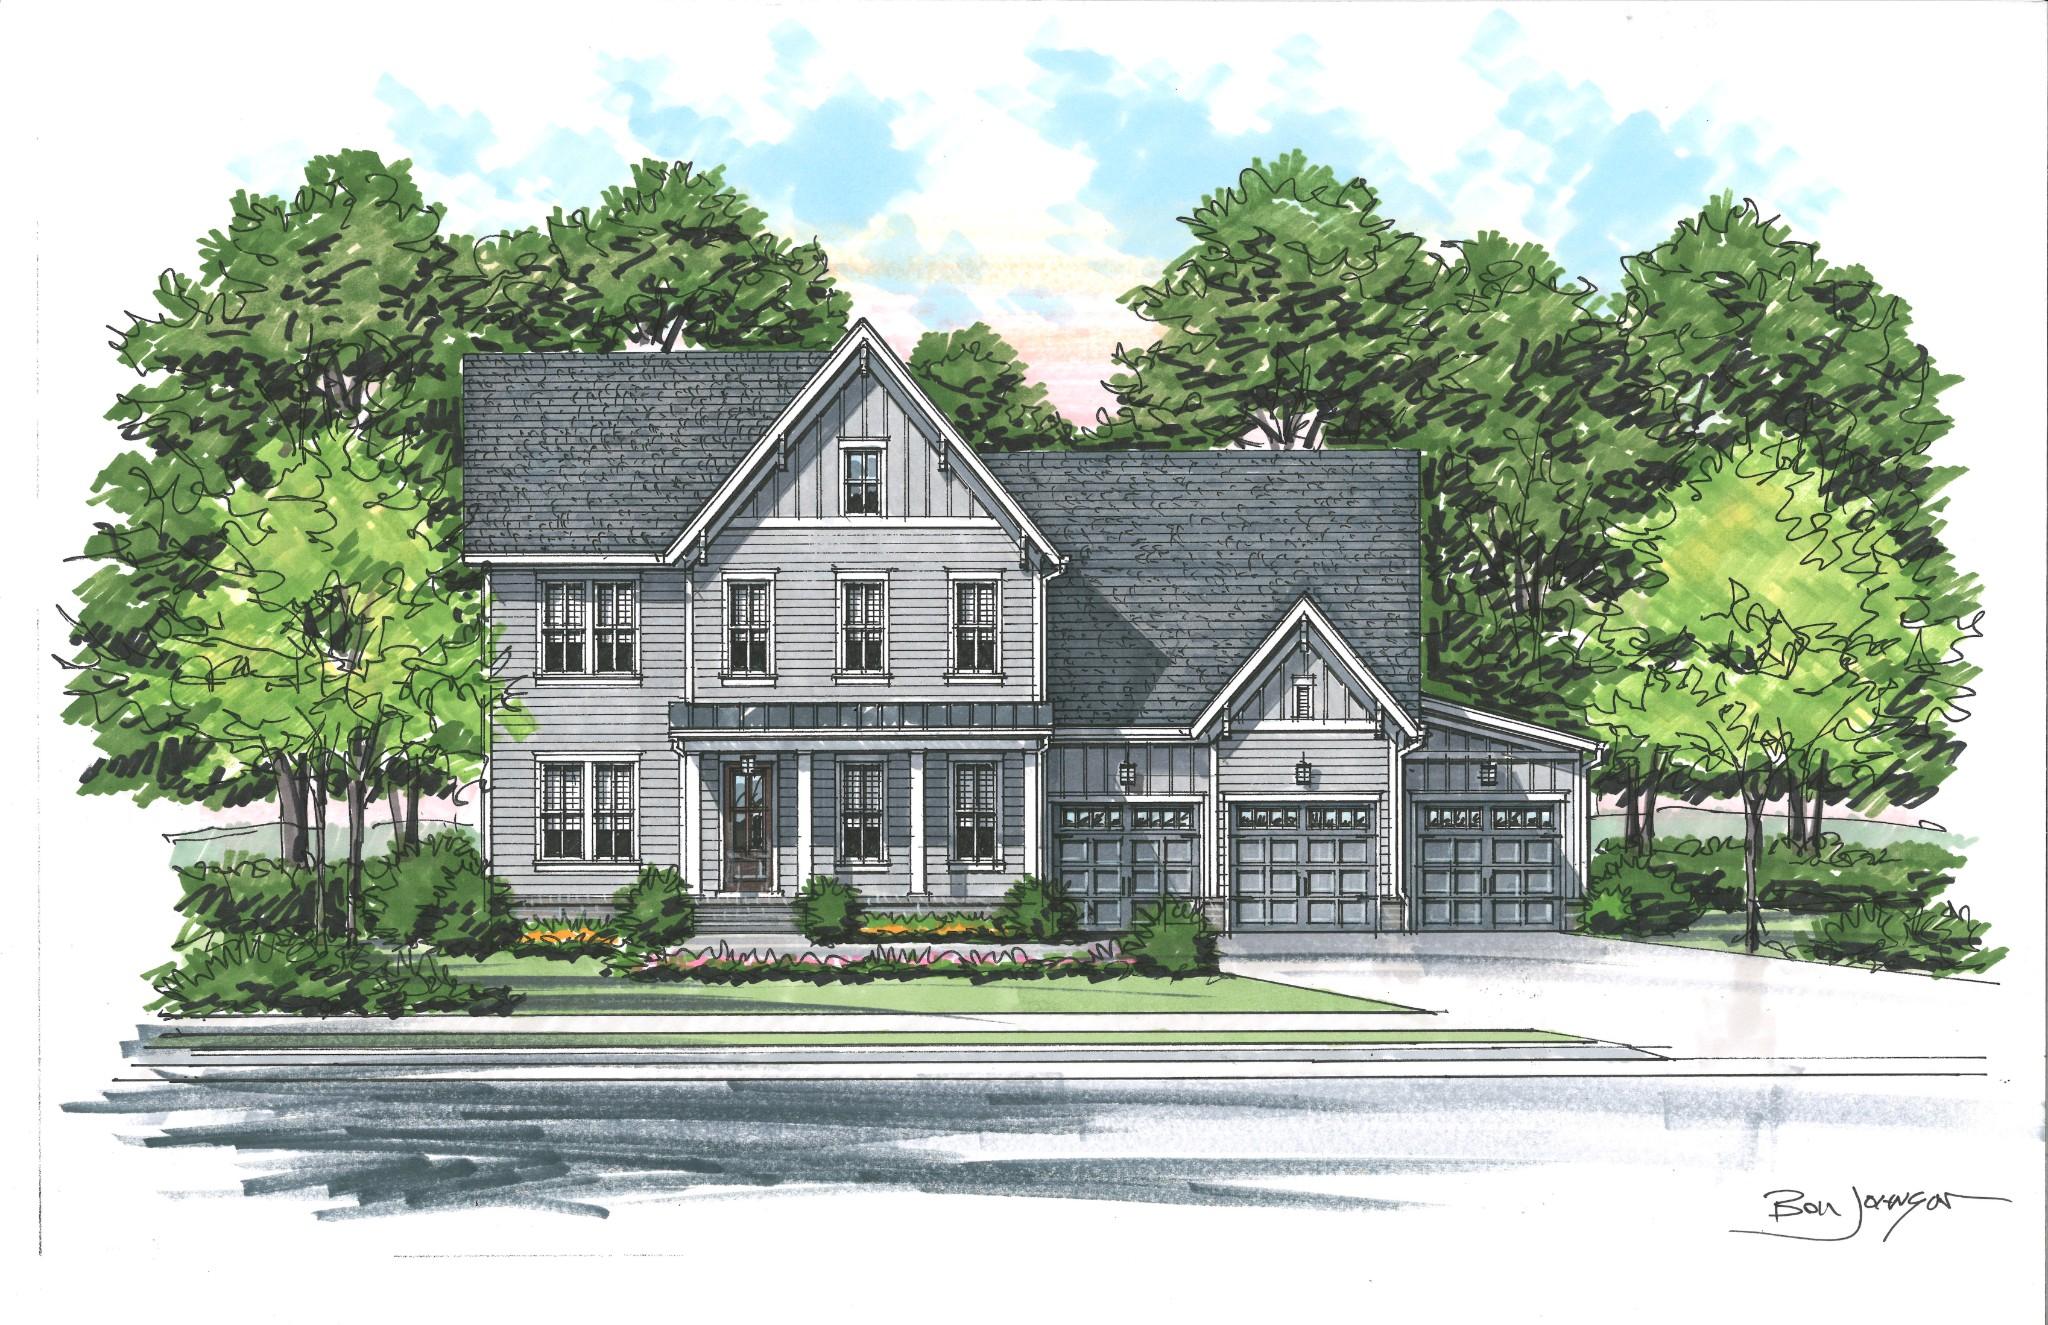 809 Carsten St-Lot 404, Nashville, TN 37221 - Nashville, TN real estate listing